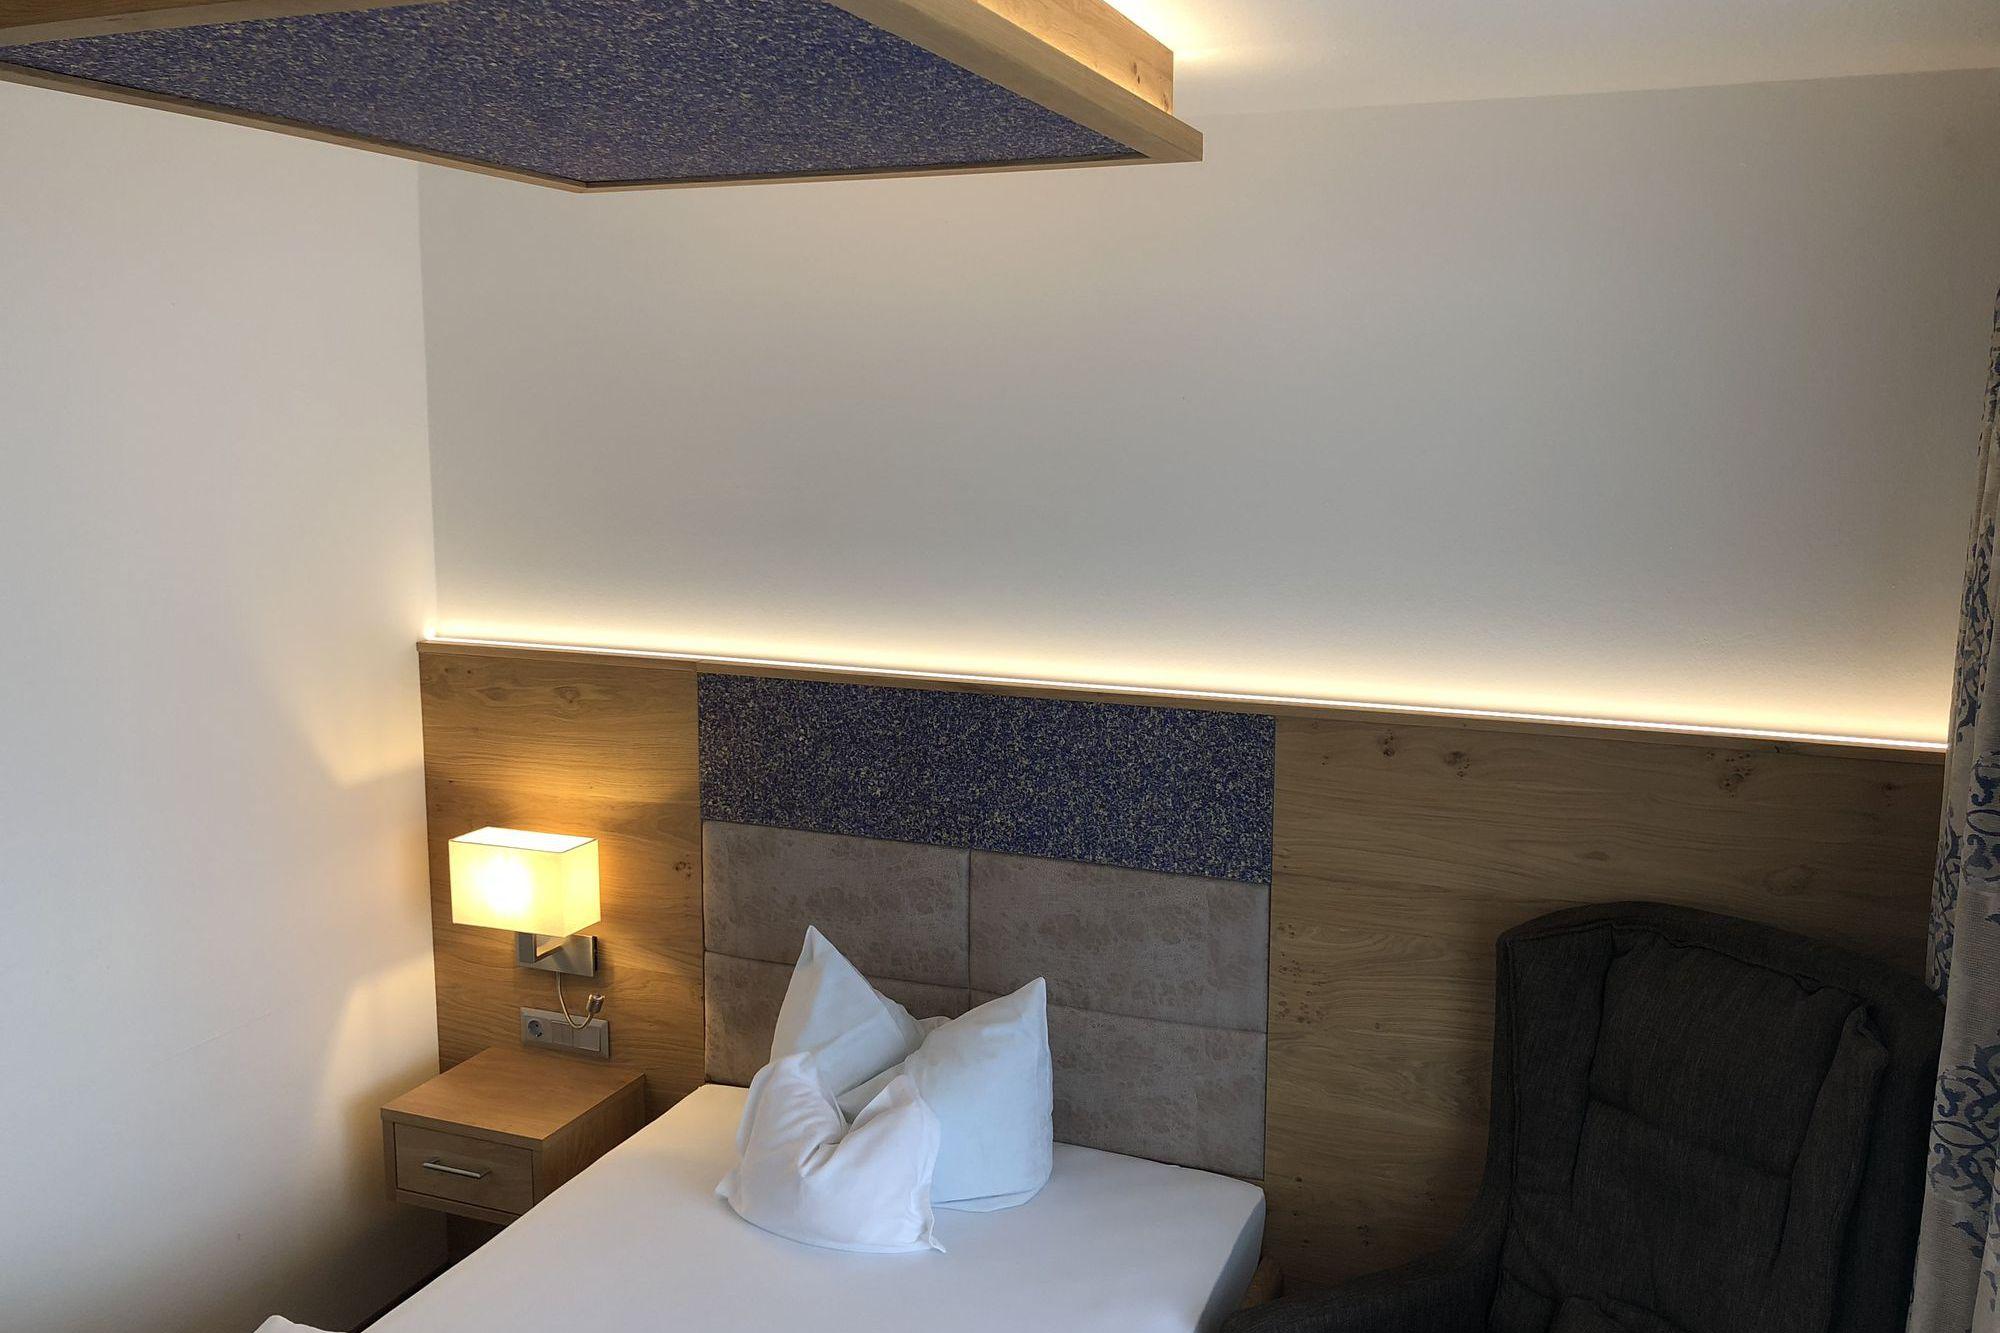 https://www.hotelbinder.de/wp-content/uploads/einzelzimmer2_7.jpg